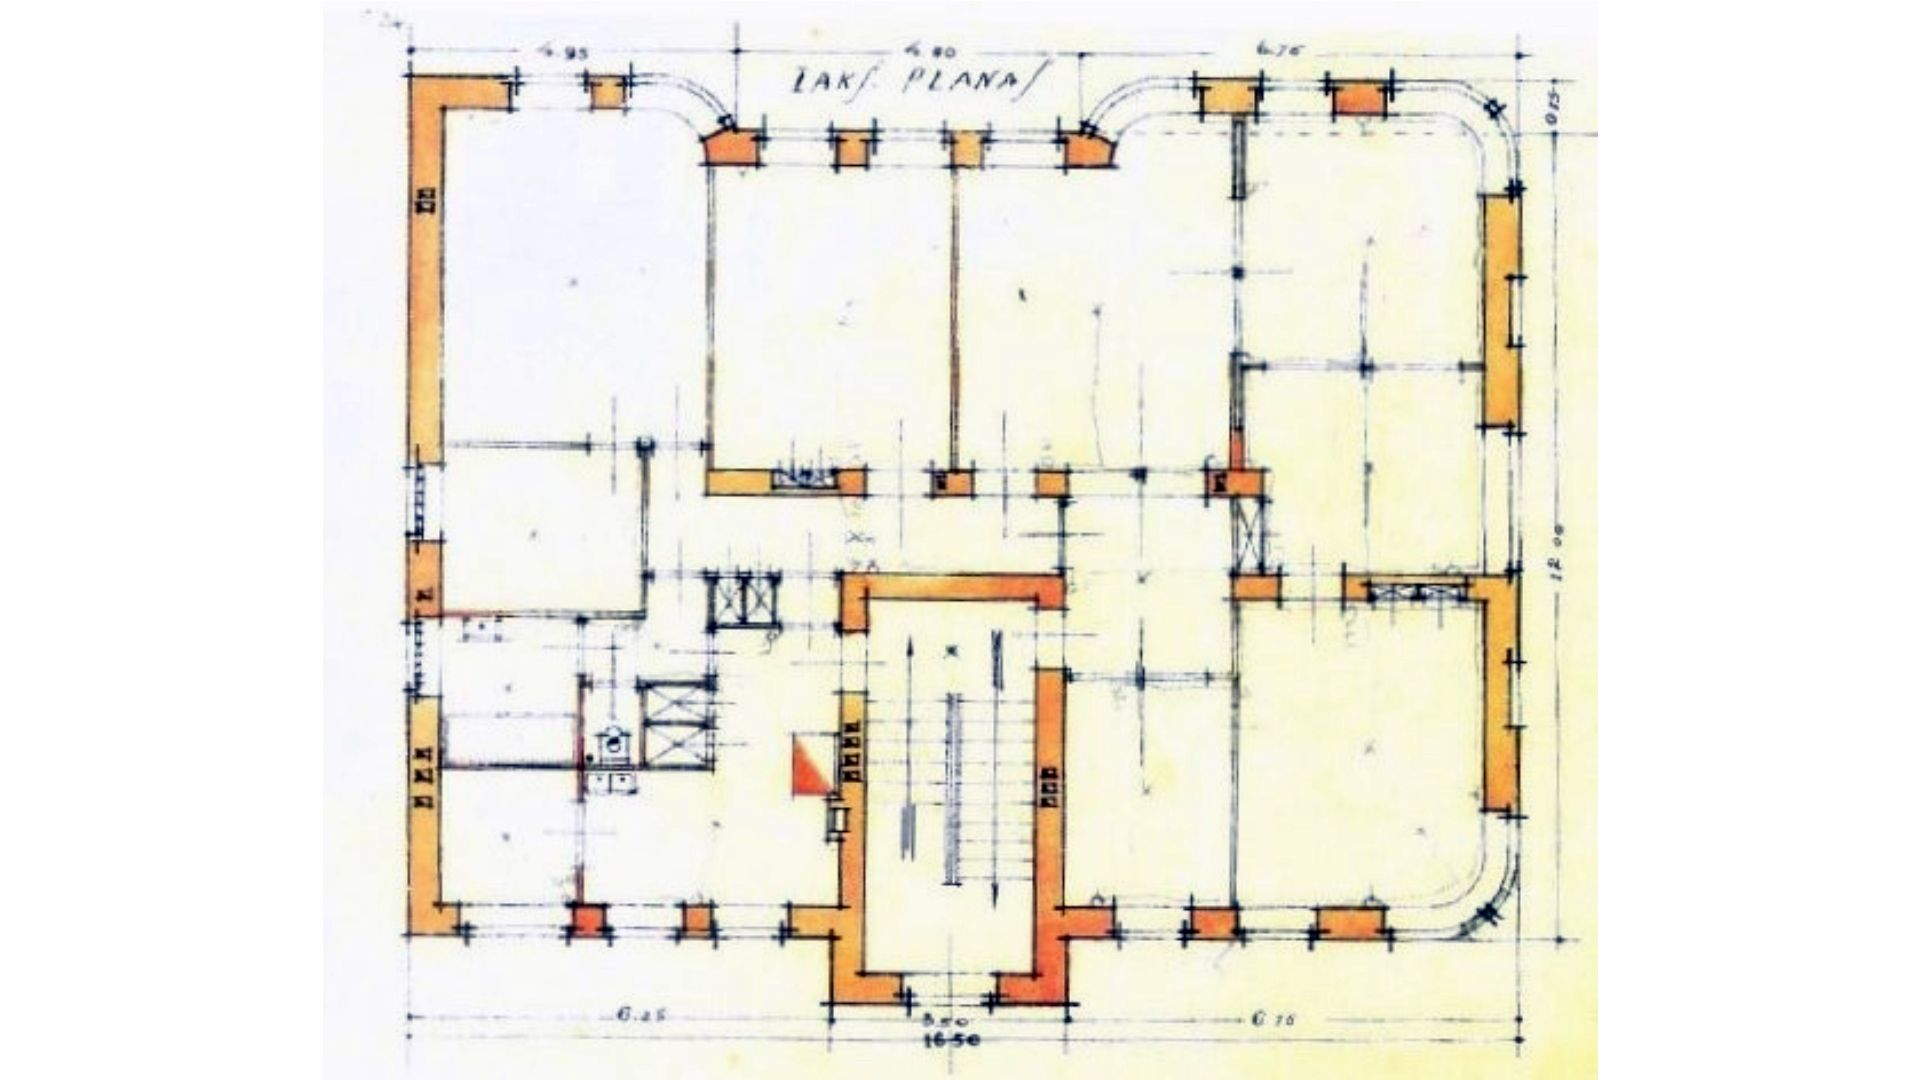 matijošaičių namo planas